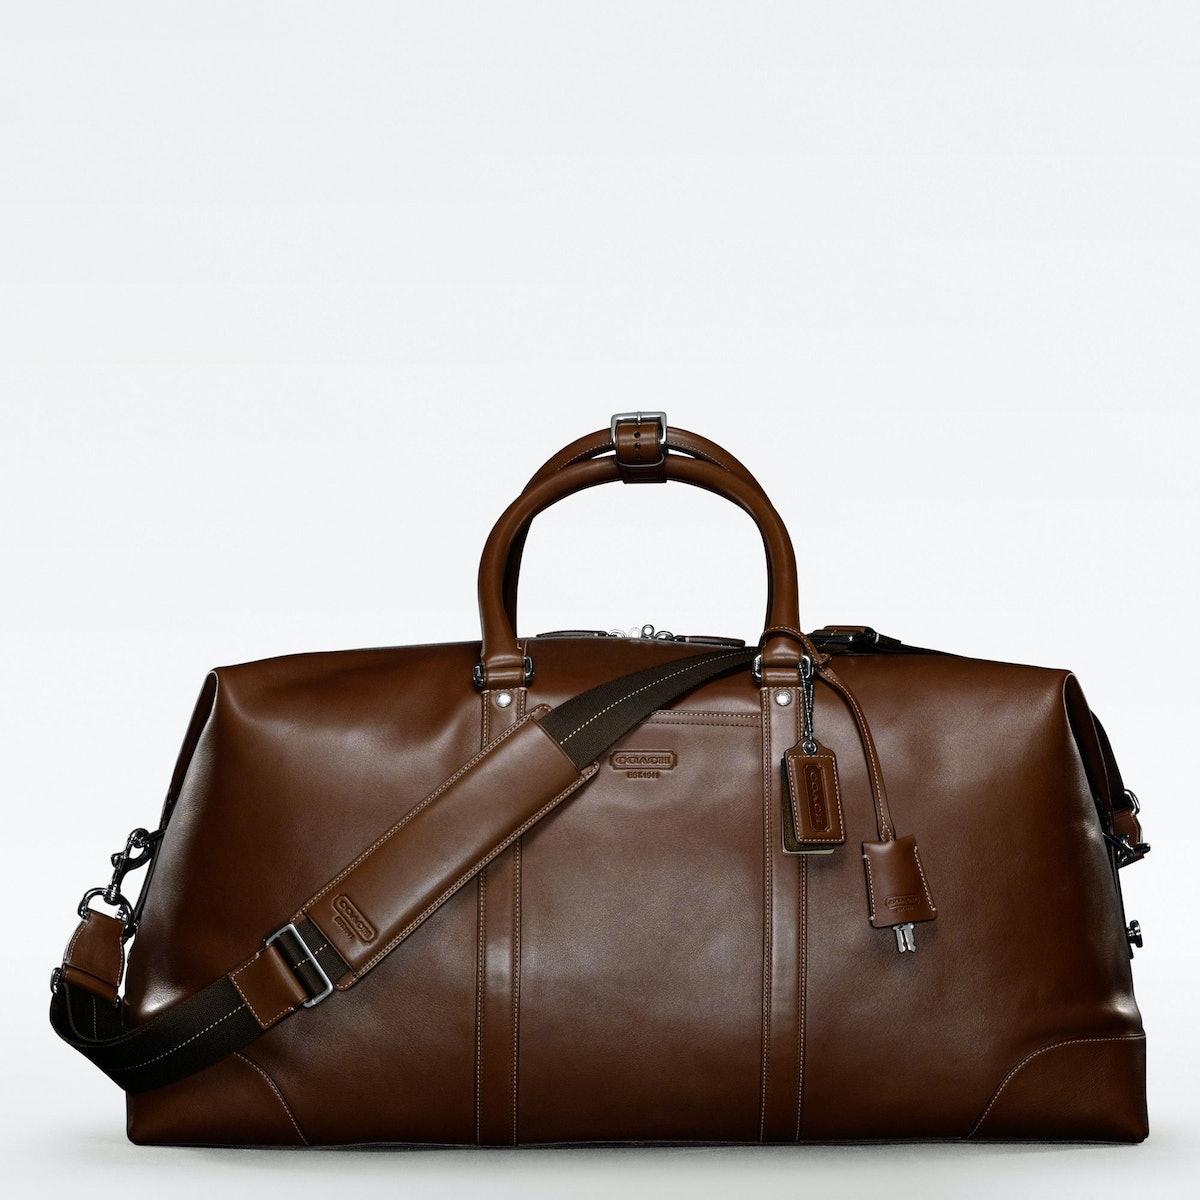 Coach suitcase